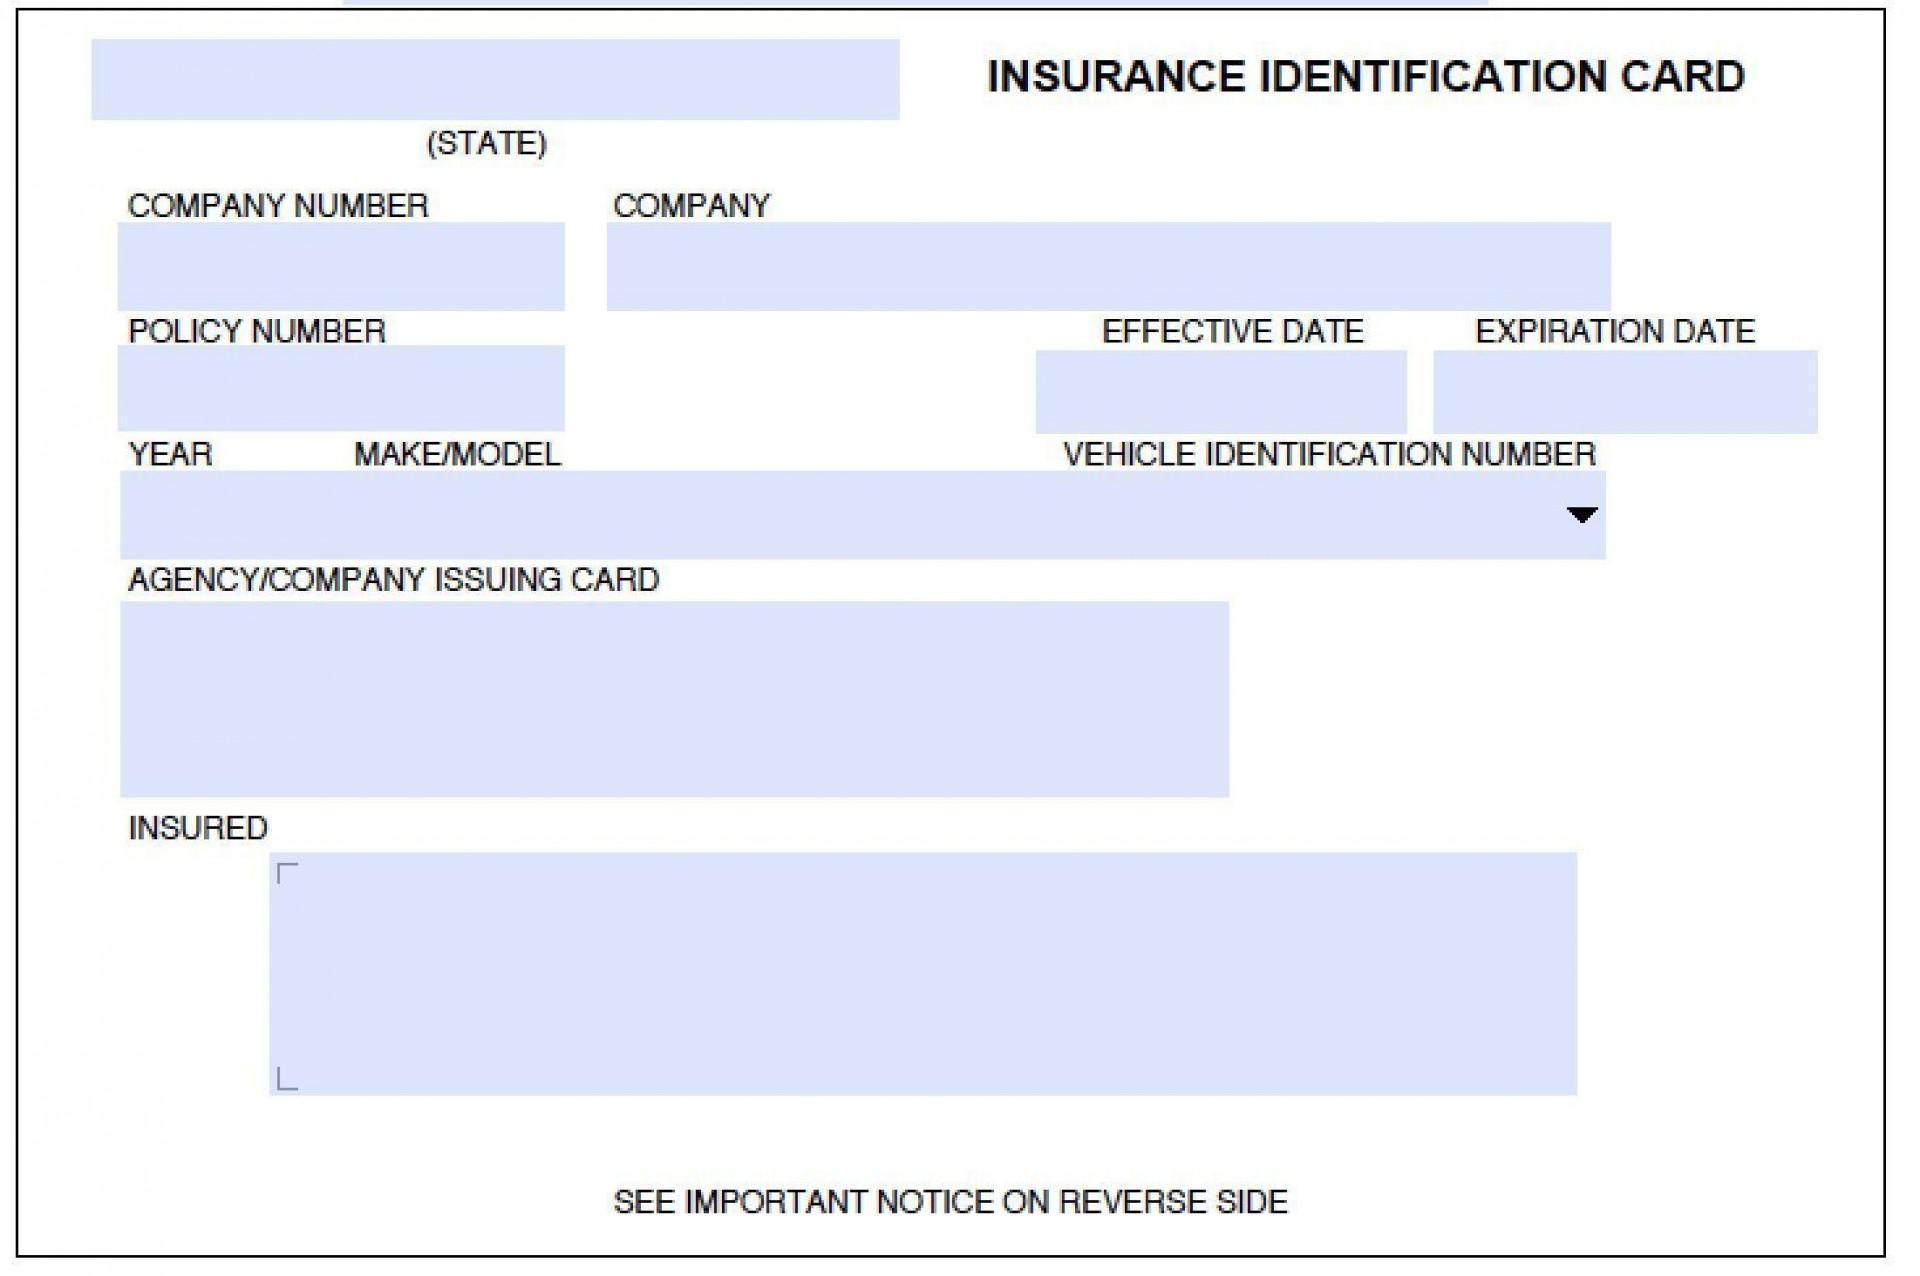 000 Sensational Auto Insurance Card Template Pdf Inspiration  Car Fake Geico Filler1920